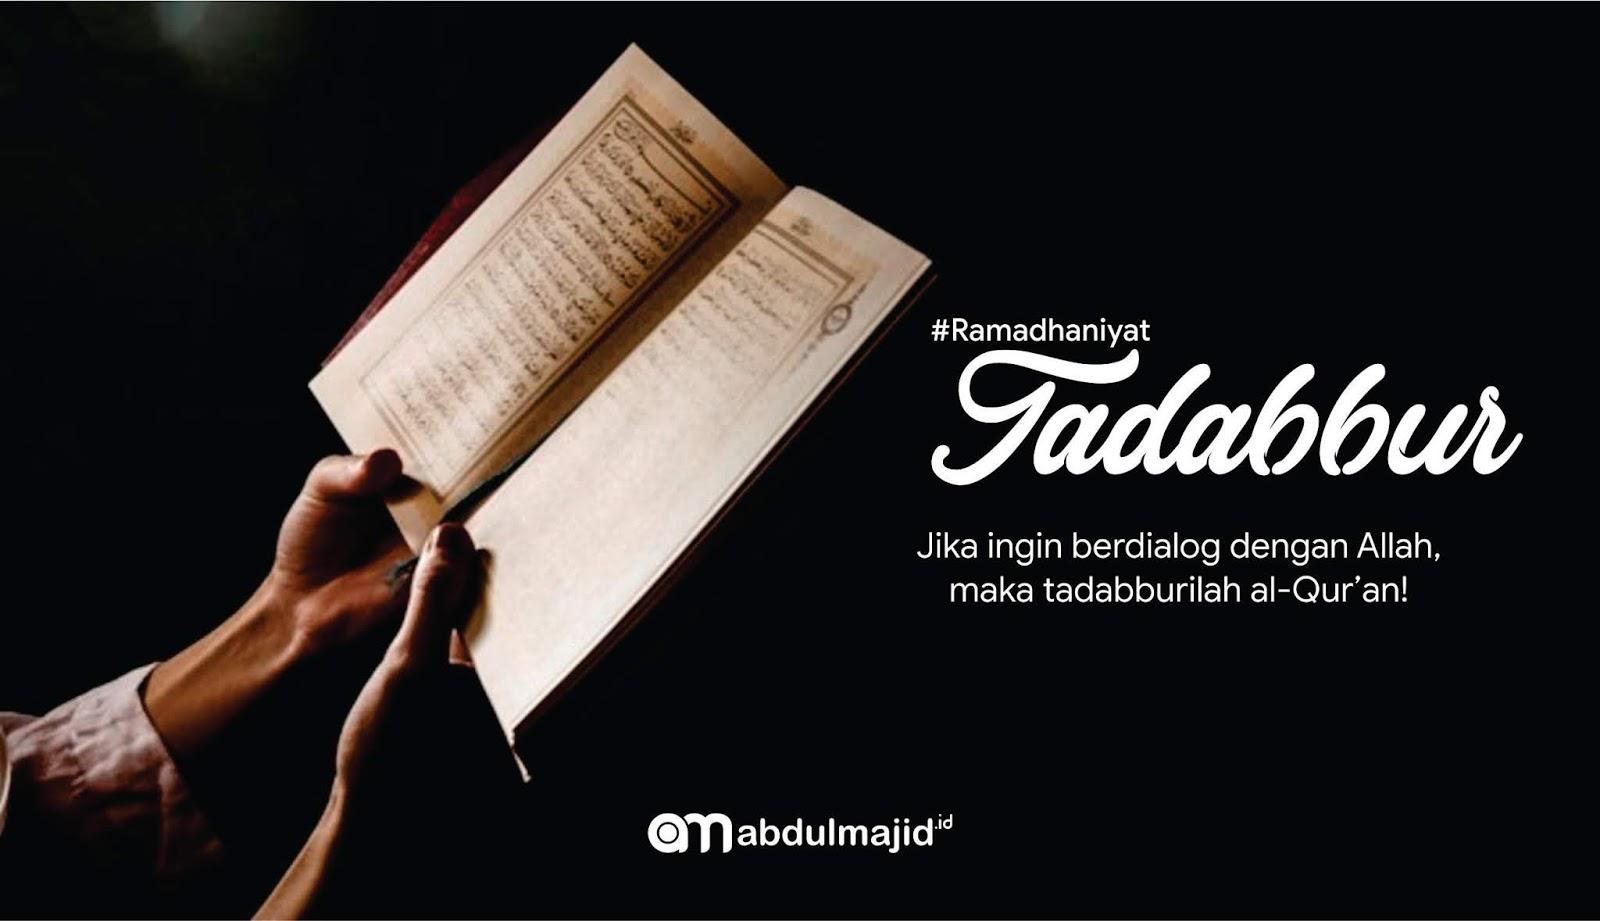 tadabbur-al-qur'an